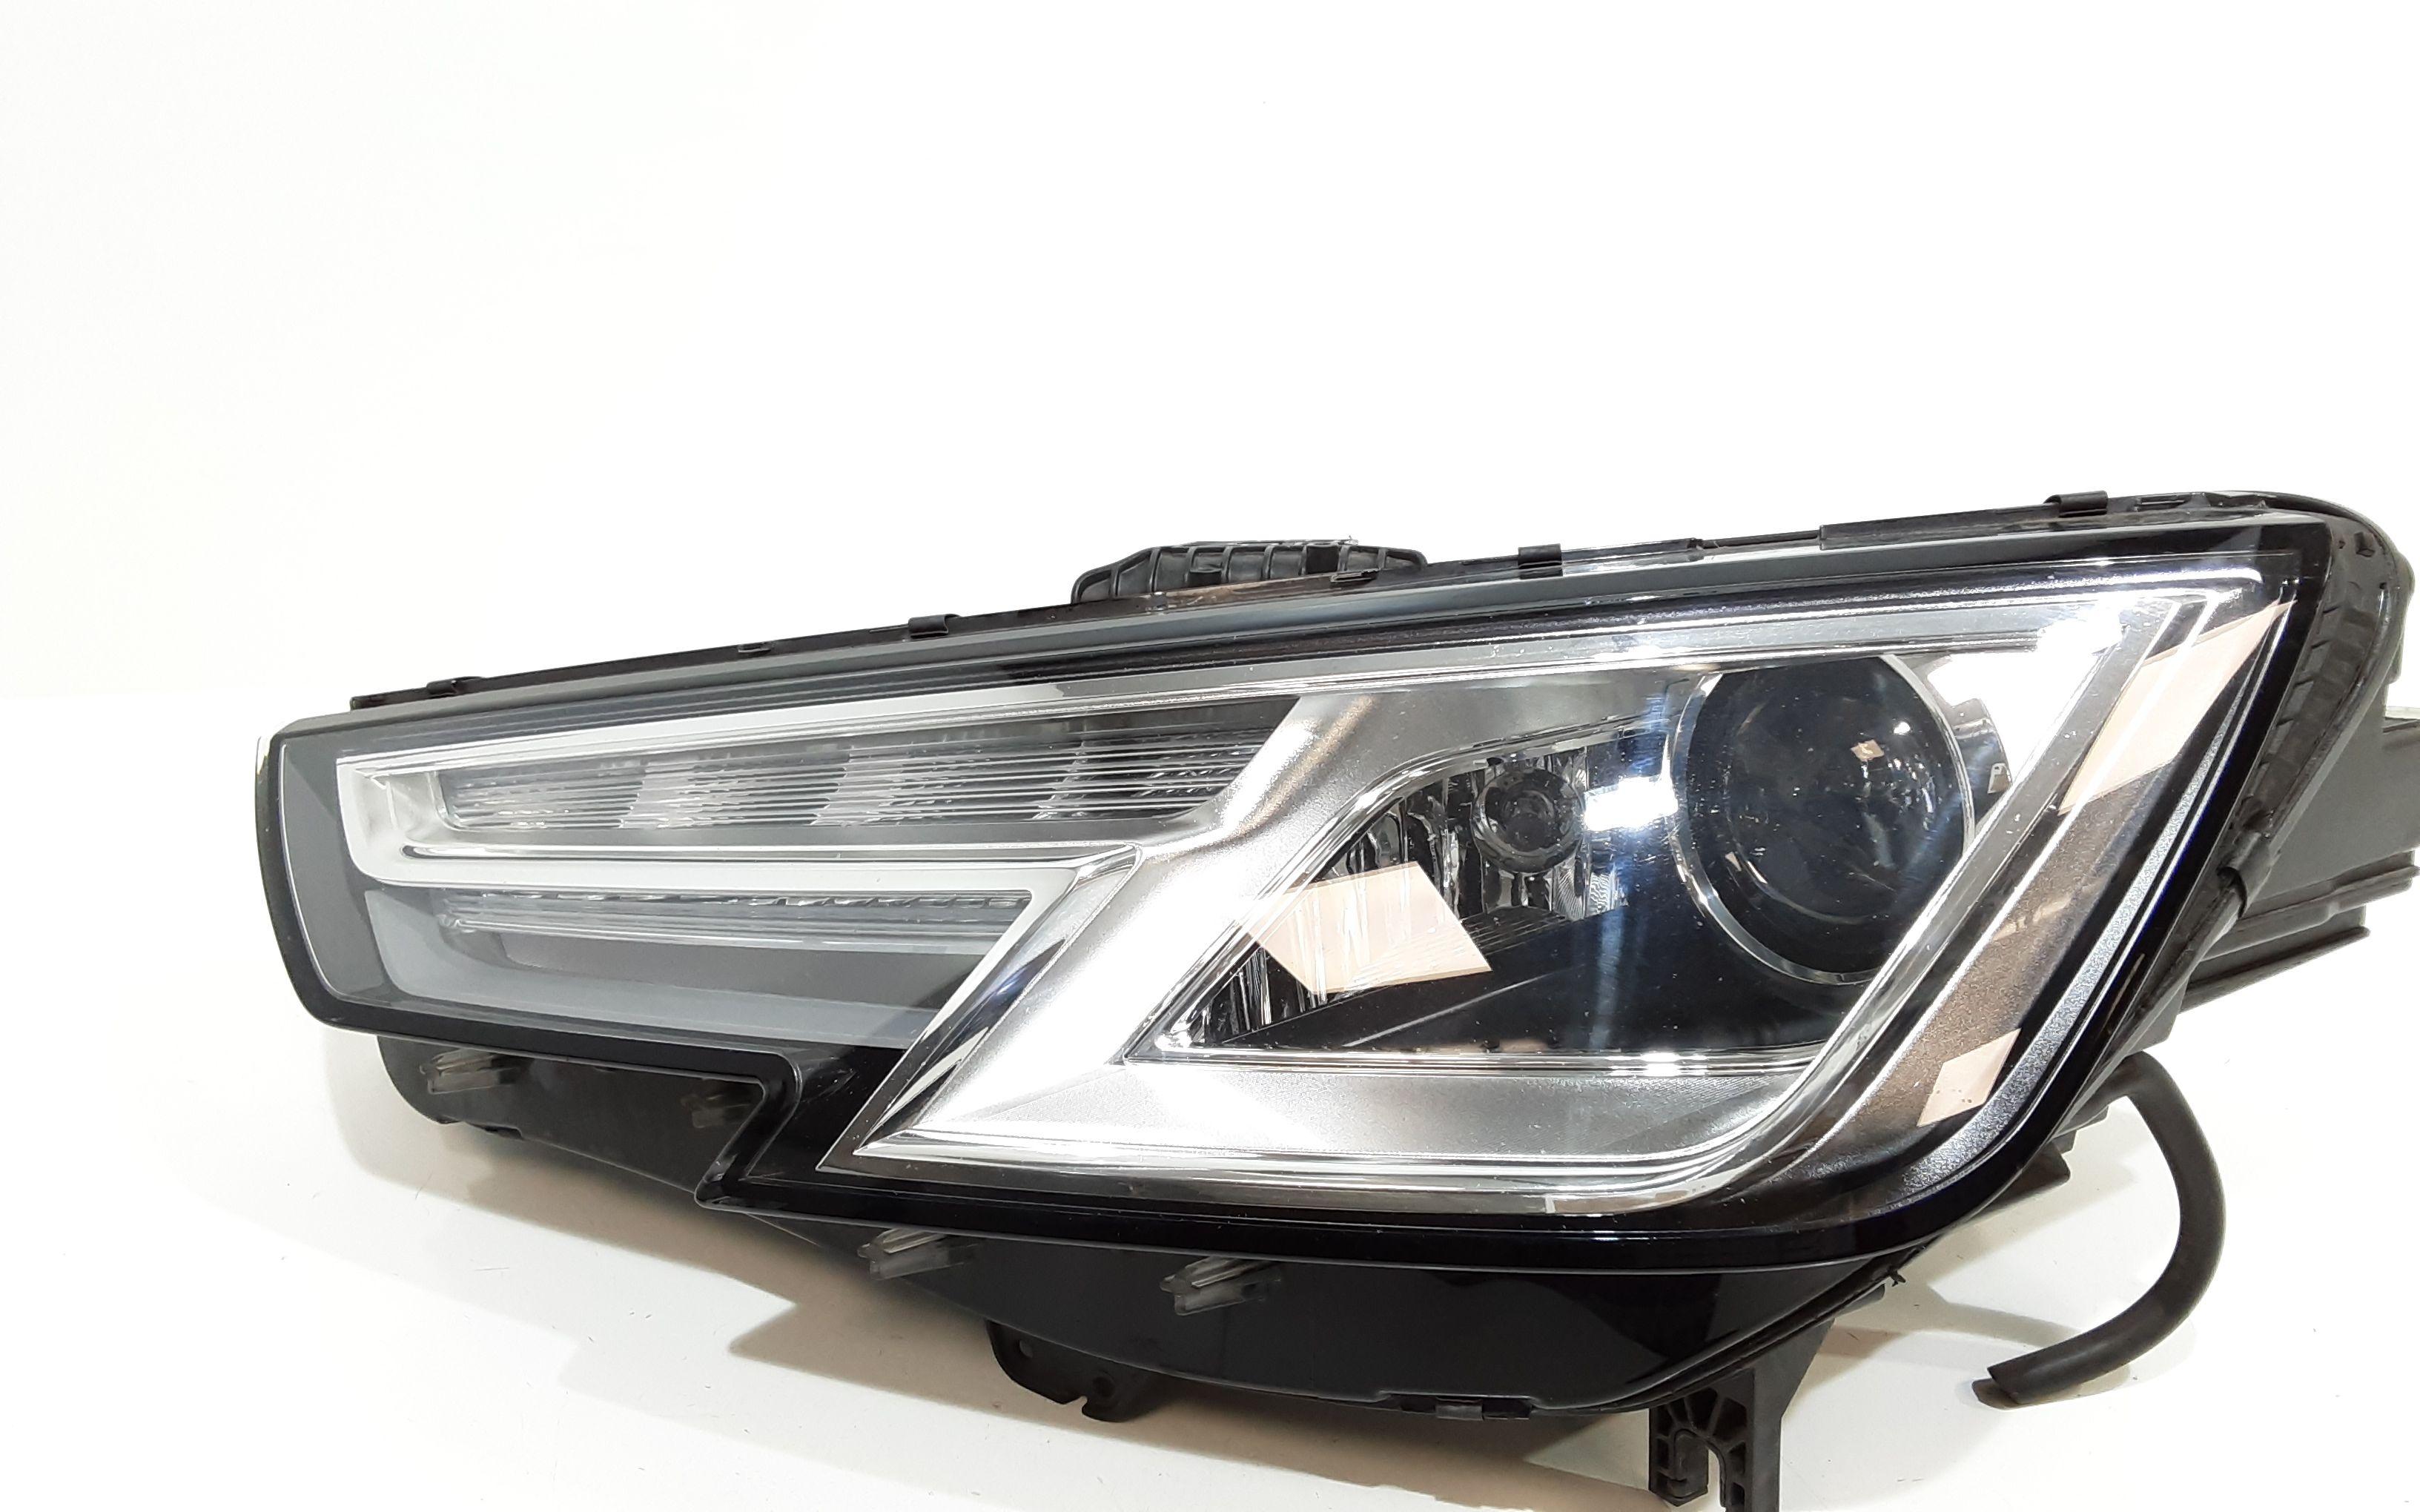 Ricambi Usati 8w0941005 Faro Fanale Ant Sx A Led Audi A4 Avant 8w5 20 384122 Ebay